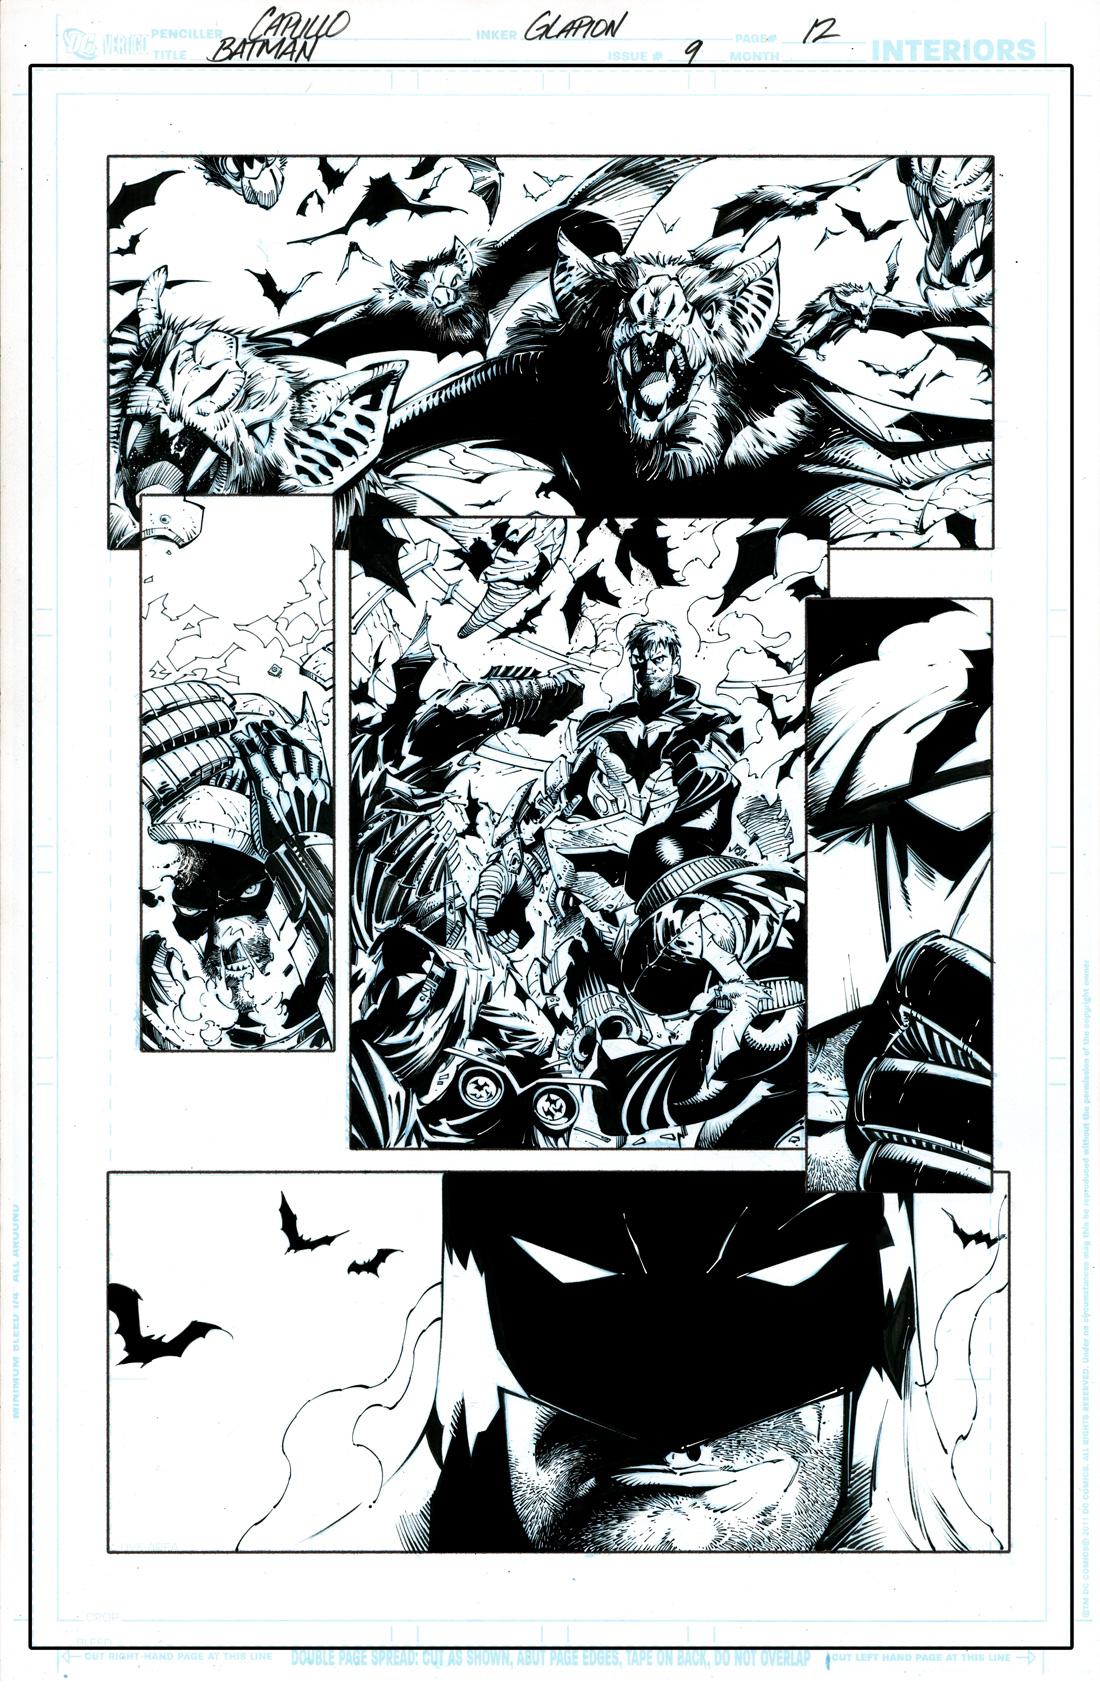 Batman issue9 pg12 by JonathanGlapion